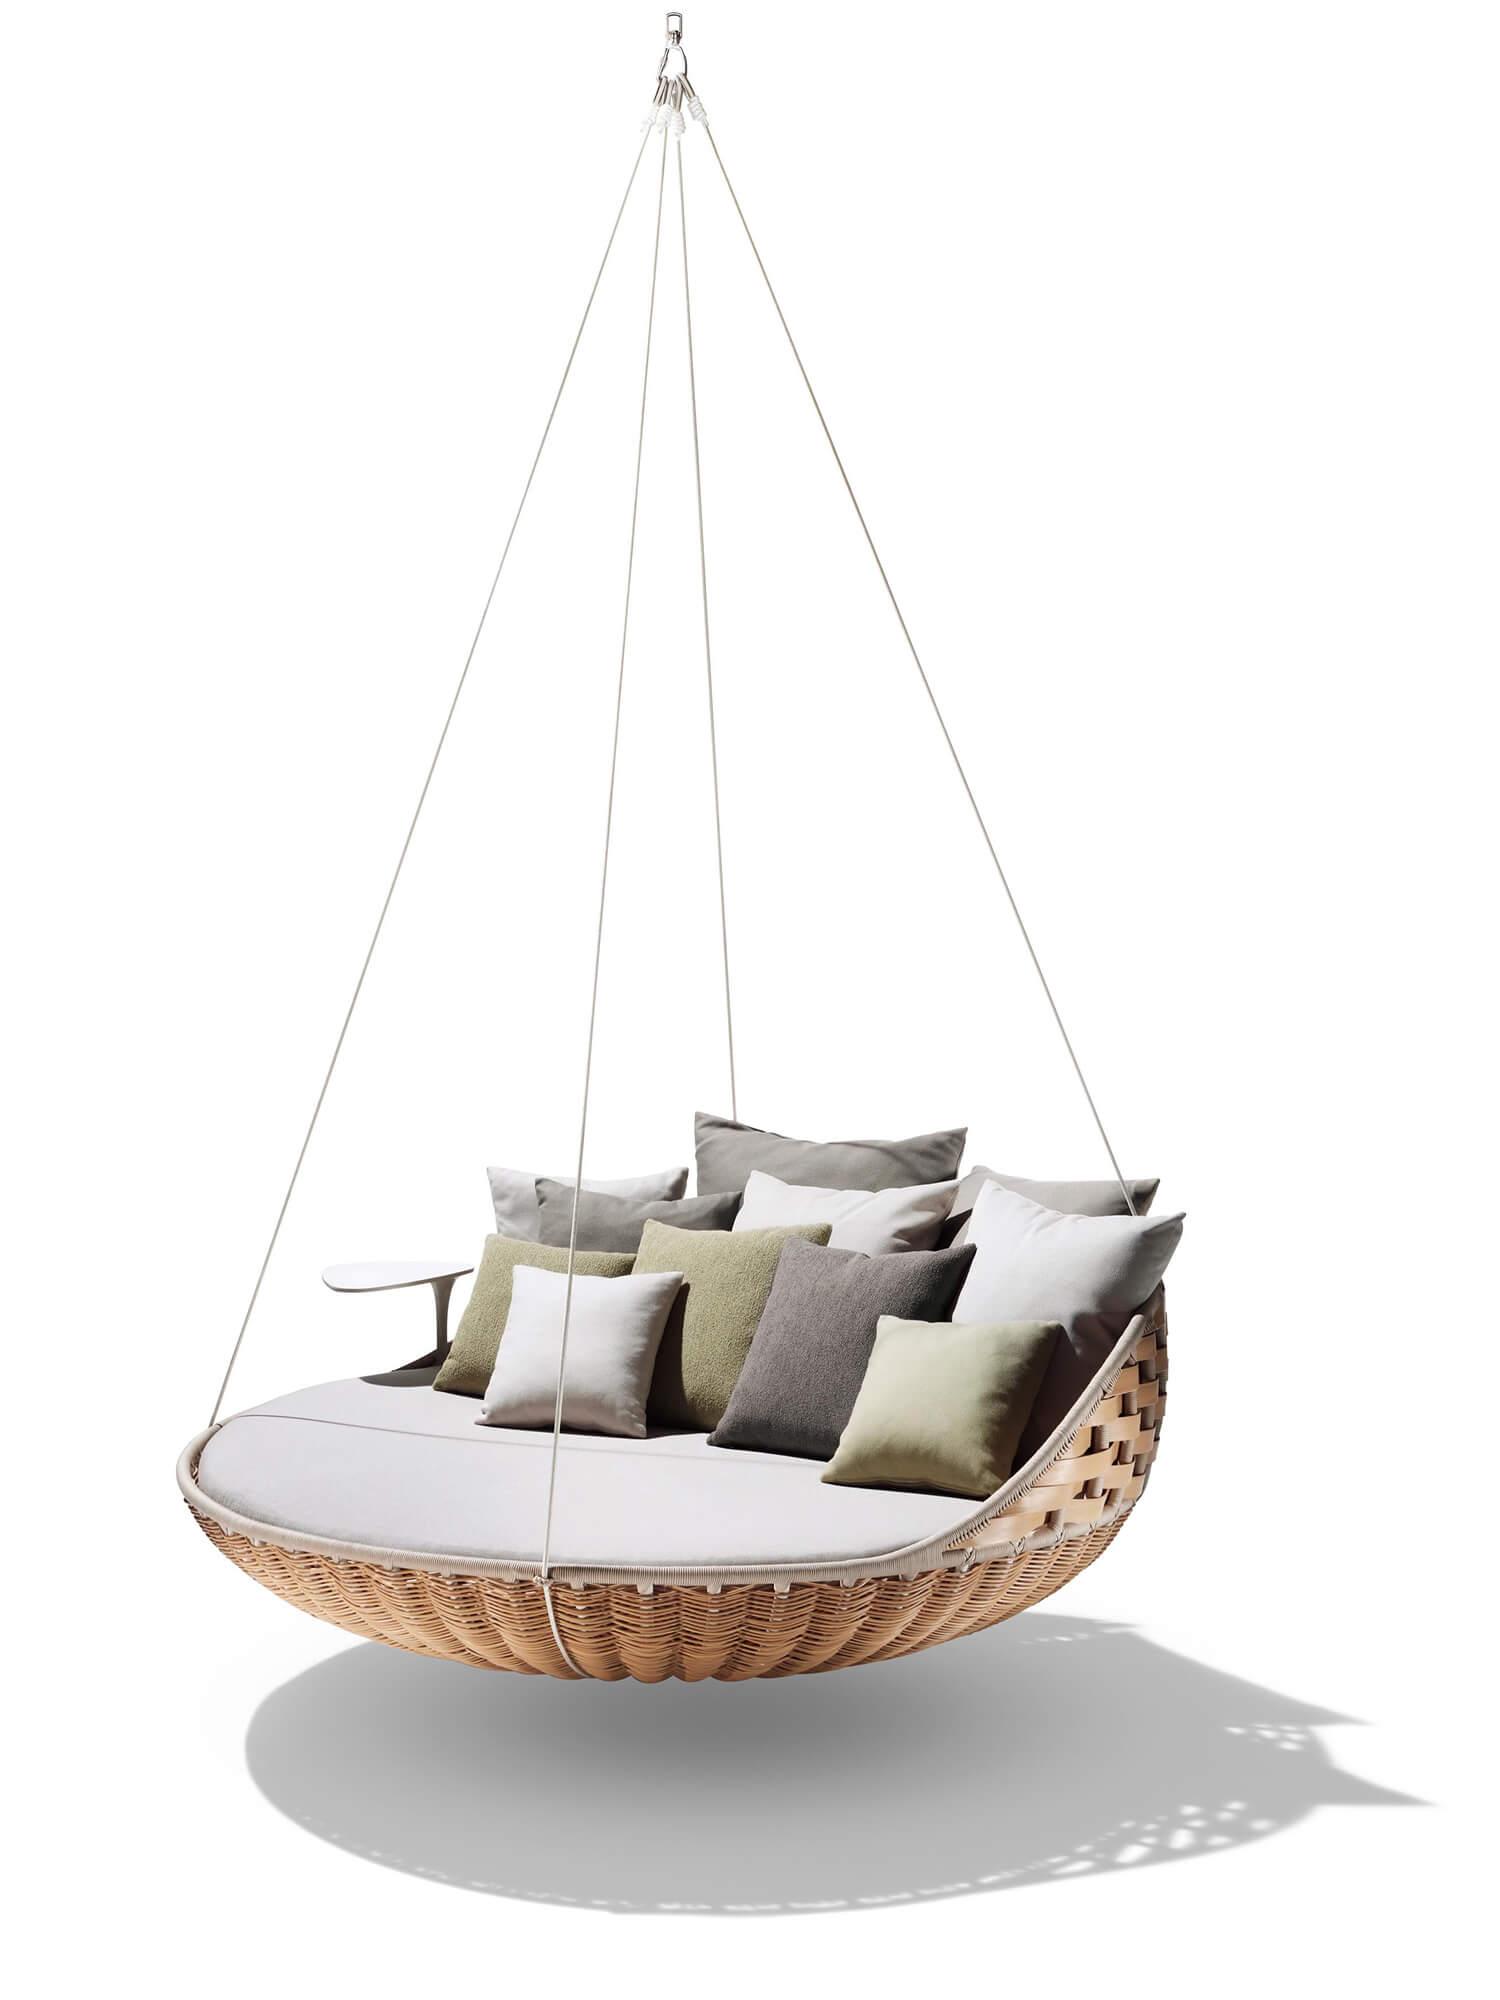 Est Living Get the Look Entertaining Outdoors Dedon Swingrest Chair